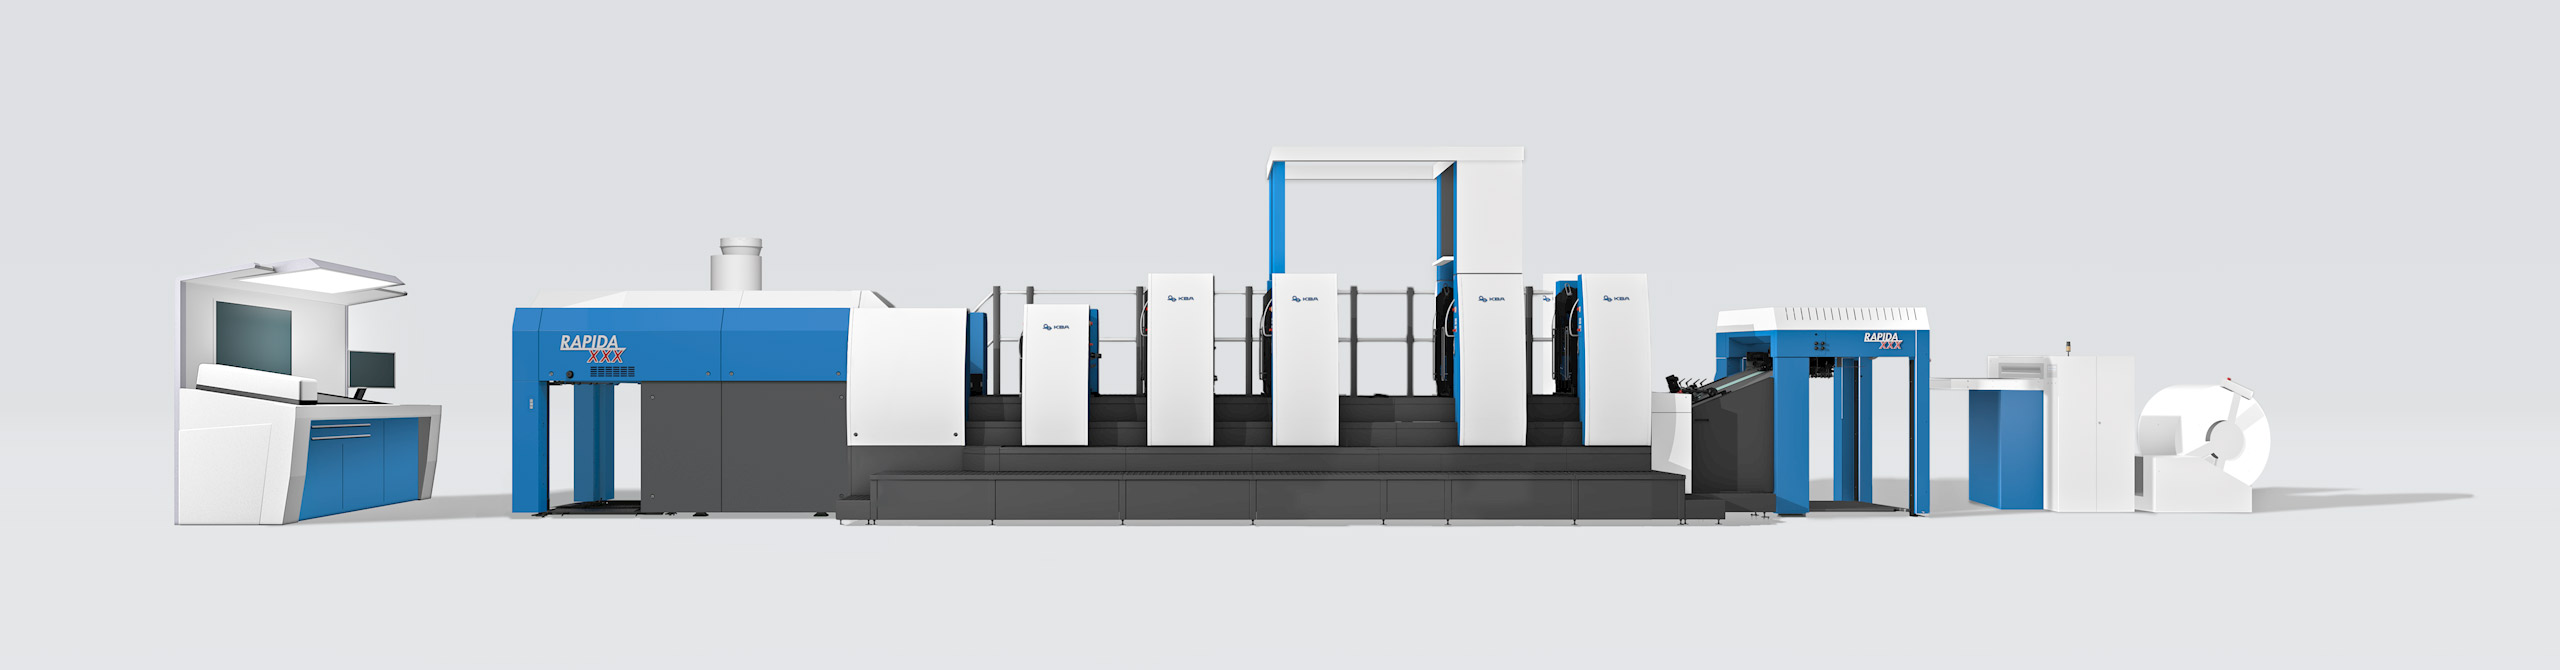 Service Select Retrofits Upgrades From Kba Koenig Bauer We Offset Press Diagram Gravure Printing Cleantronic Uv